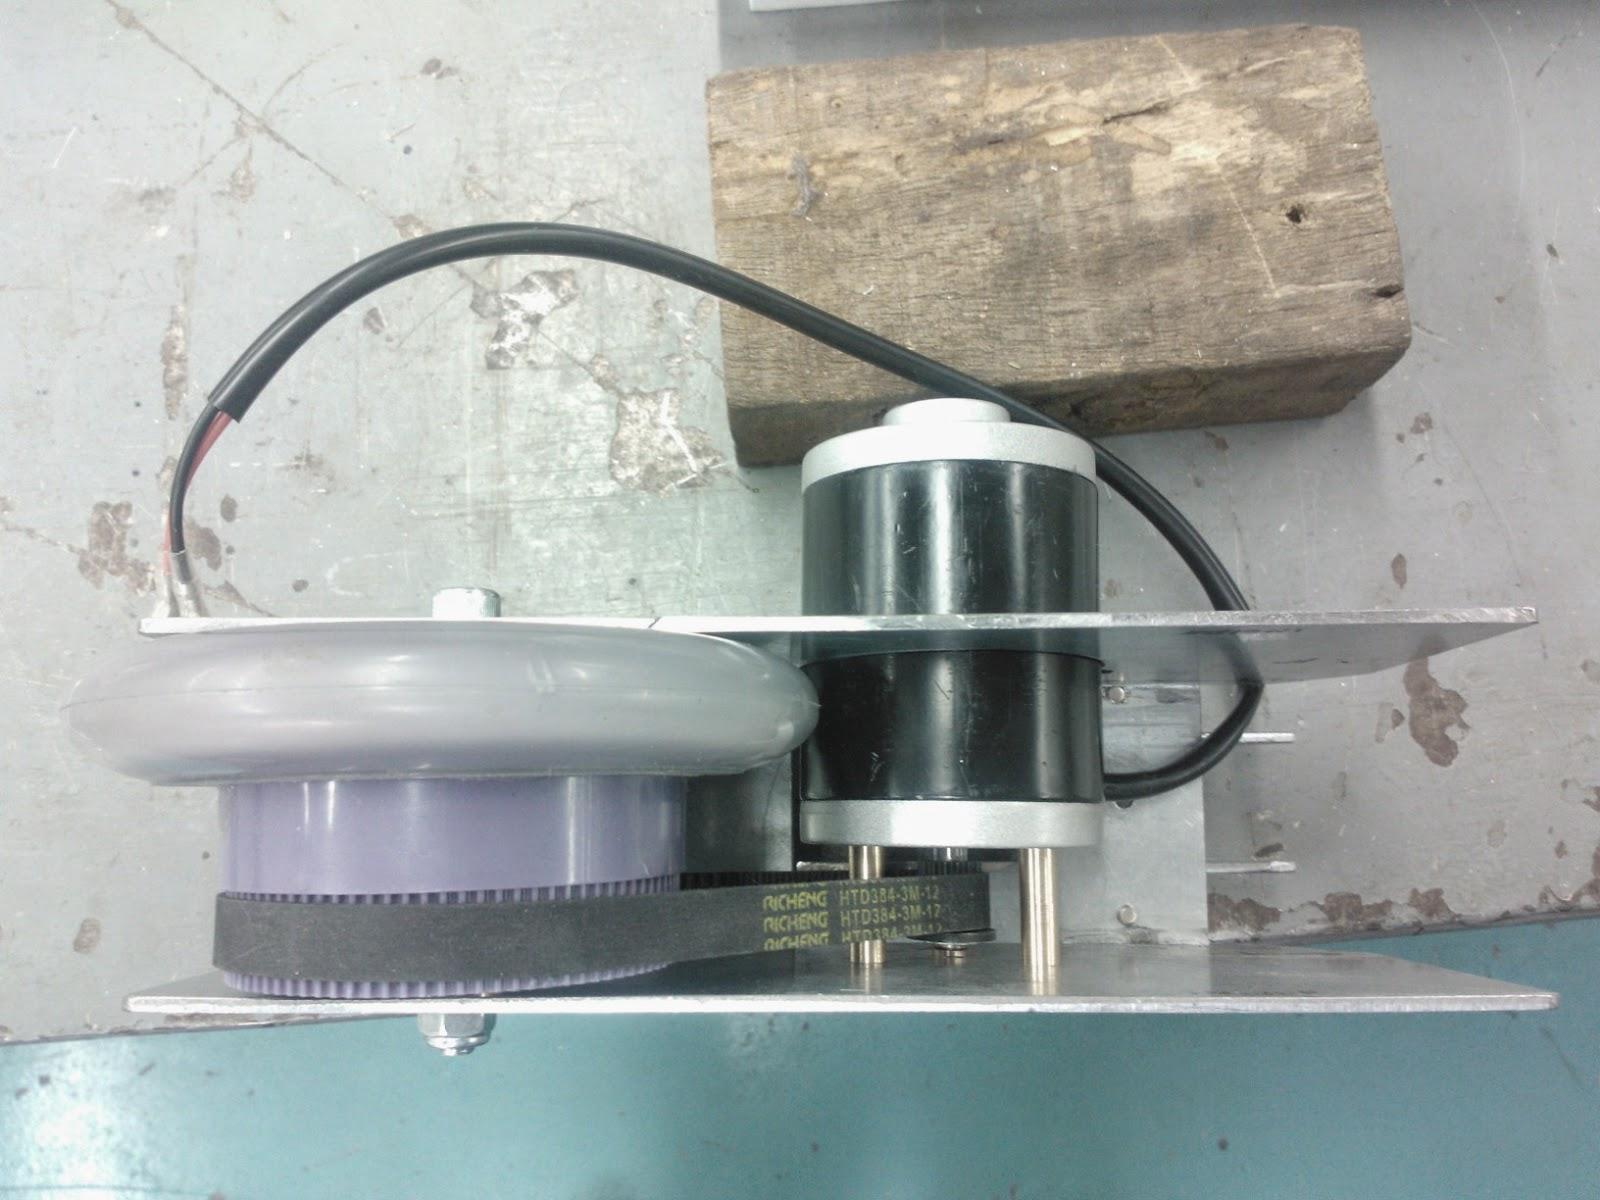 R5D4 foot motor